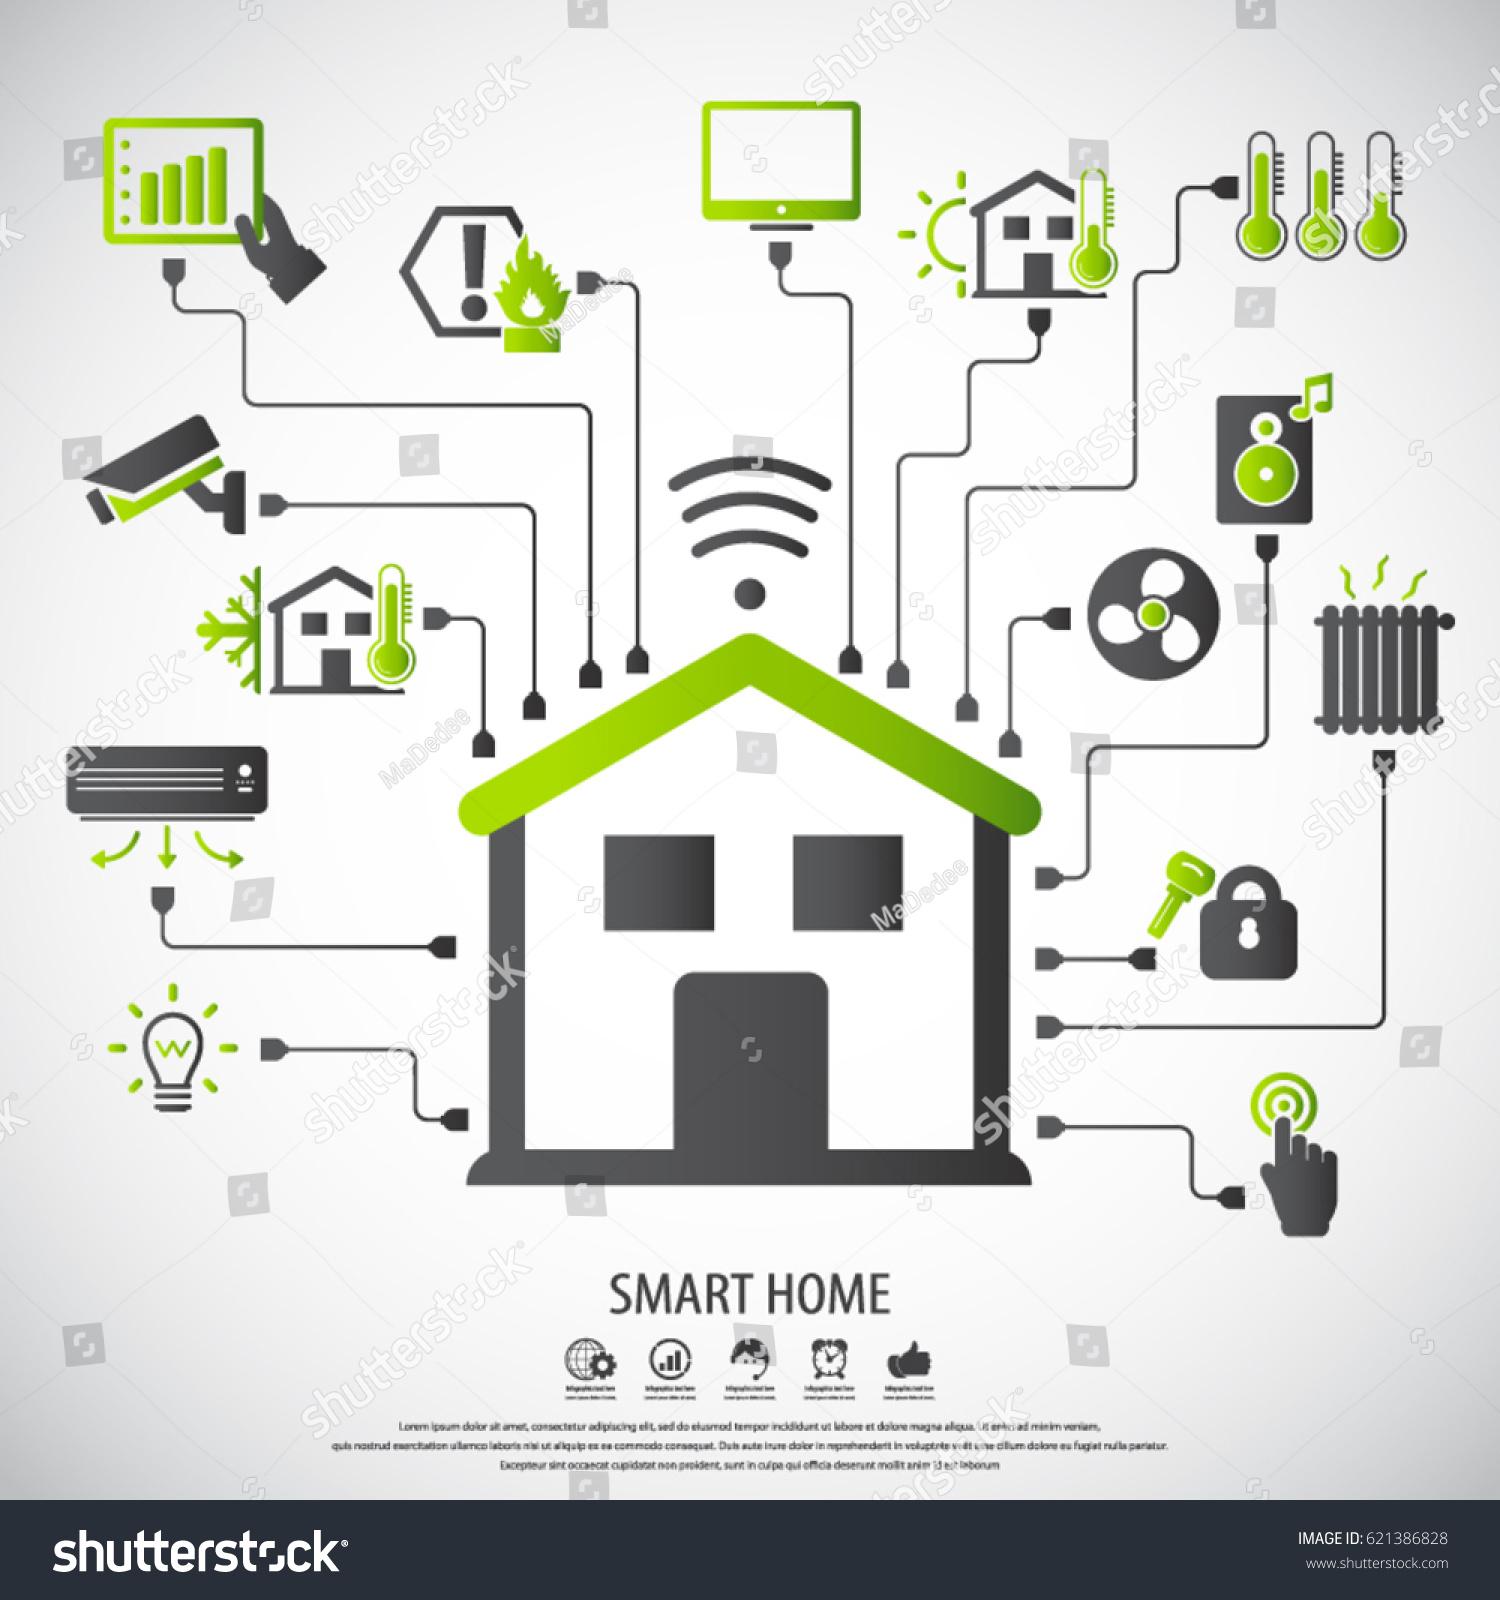 Smart Home Flat Design Style Vector Stock Vector 621386828 ...